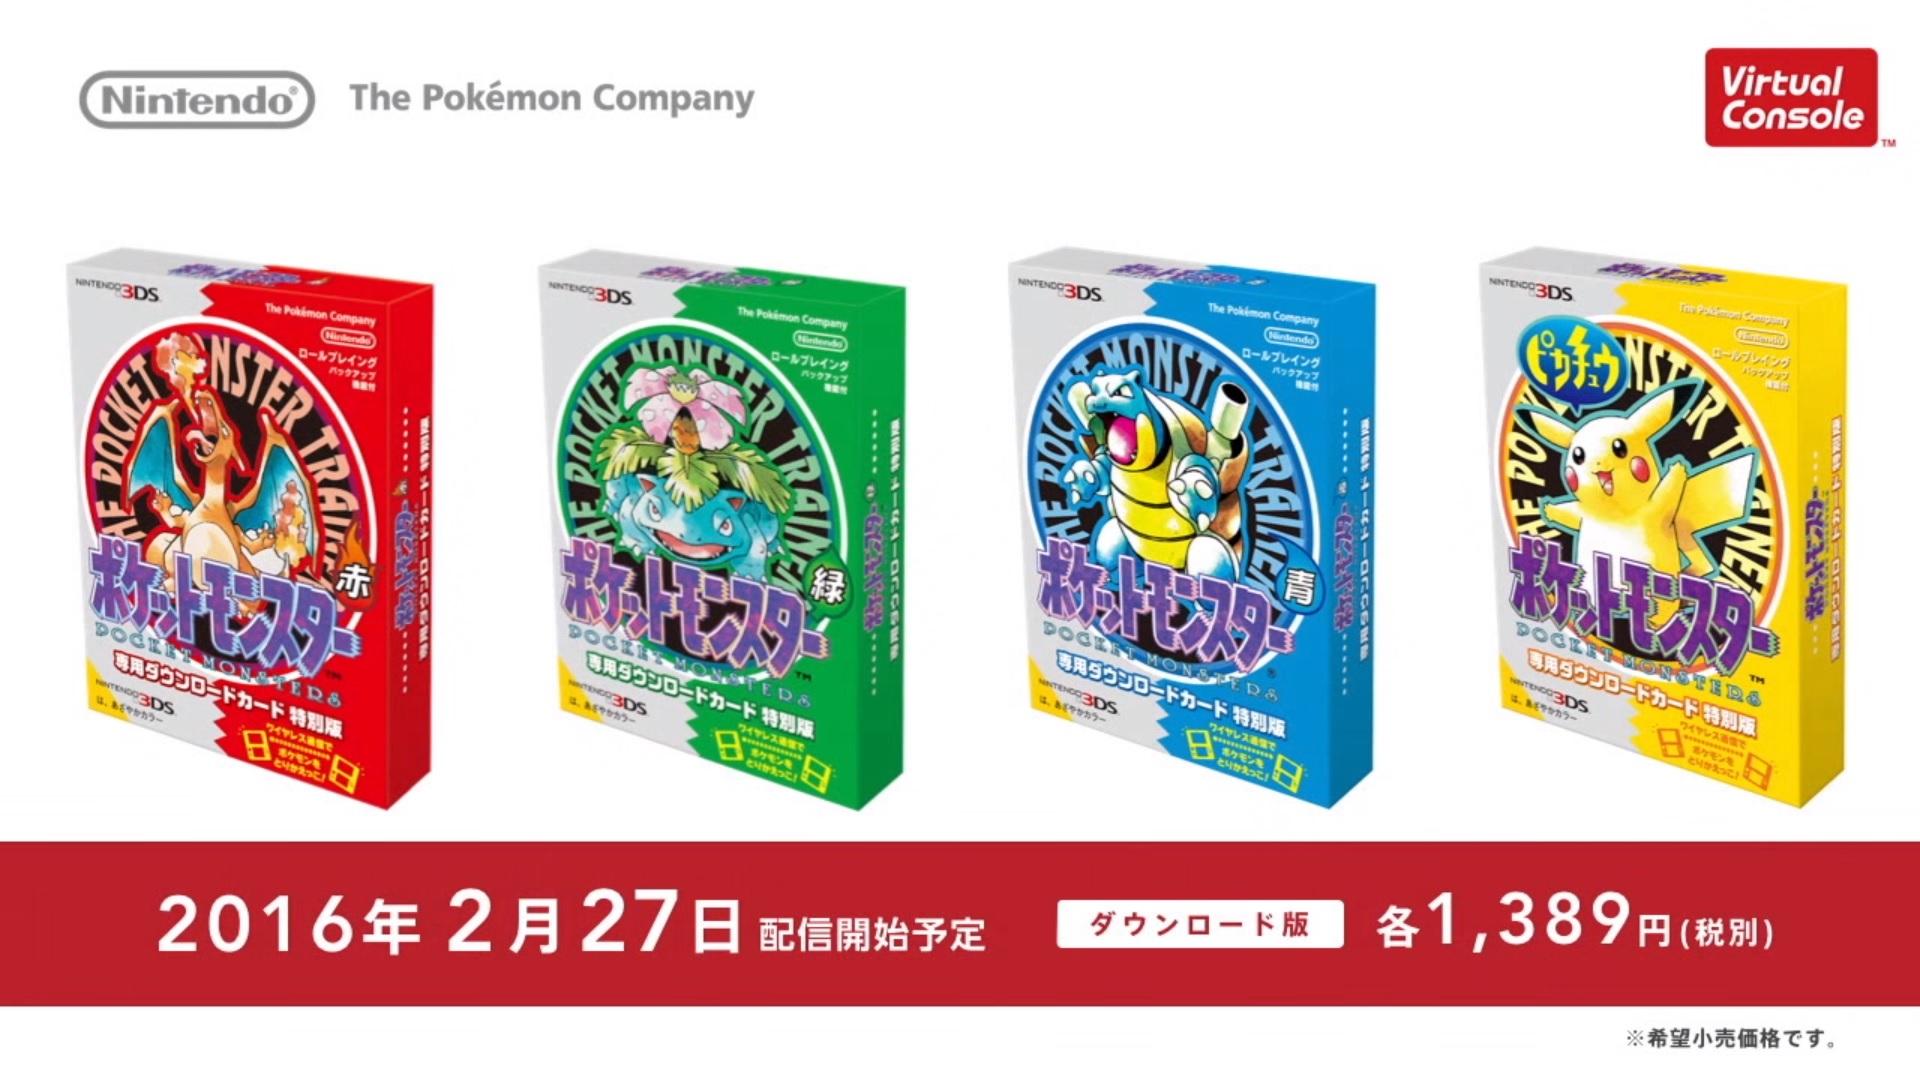 Pokémon VC Retail Package